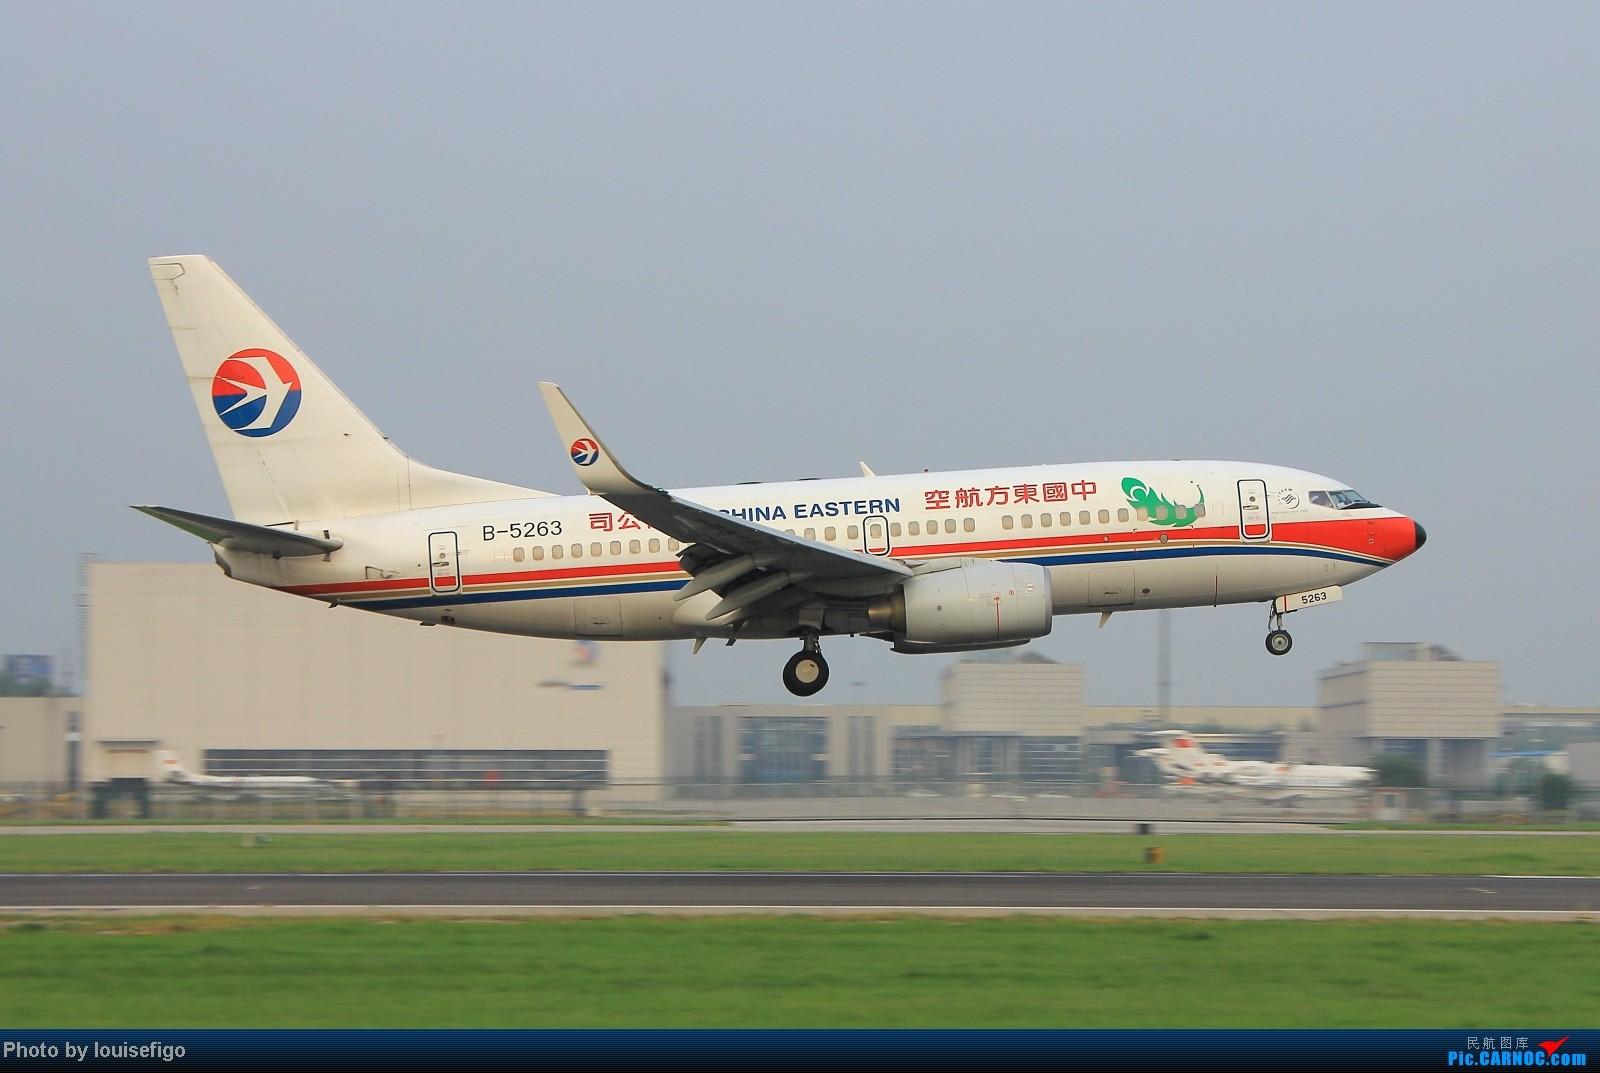 Re:[原创]闲来无事天气闷,发点冷饭自娱乐!!!PEK西跑的降落杂图~发到哪儿是哪儿啊!随心情! BOEING 737-700 B-5263 北京首都国际机场